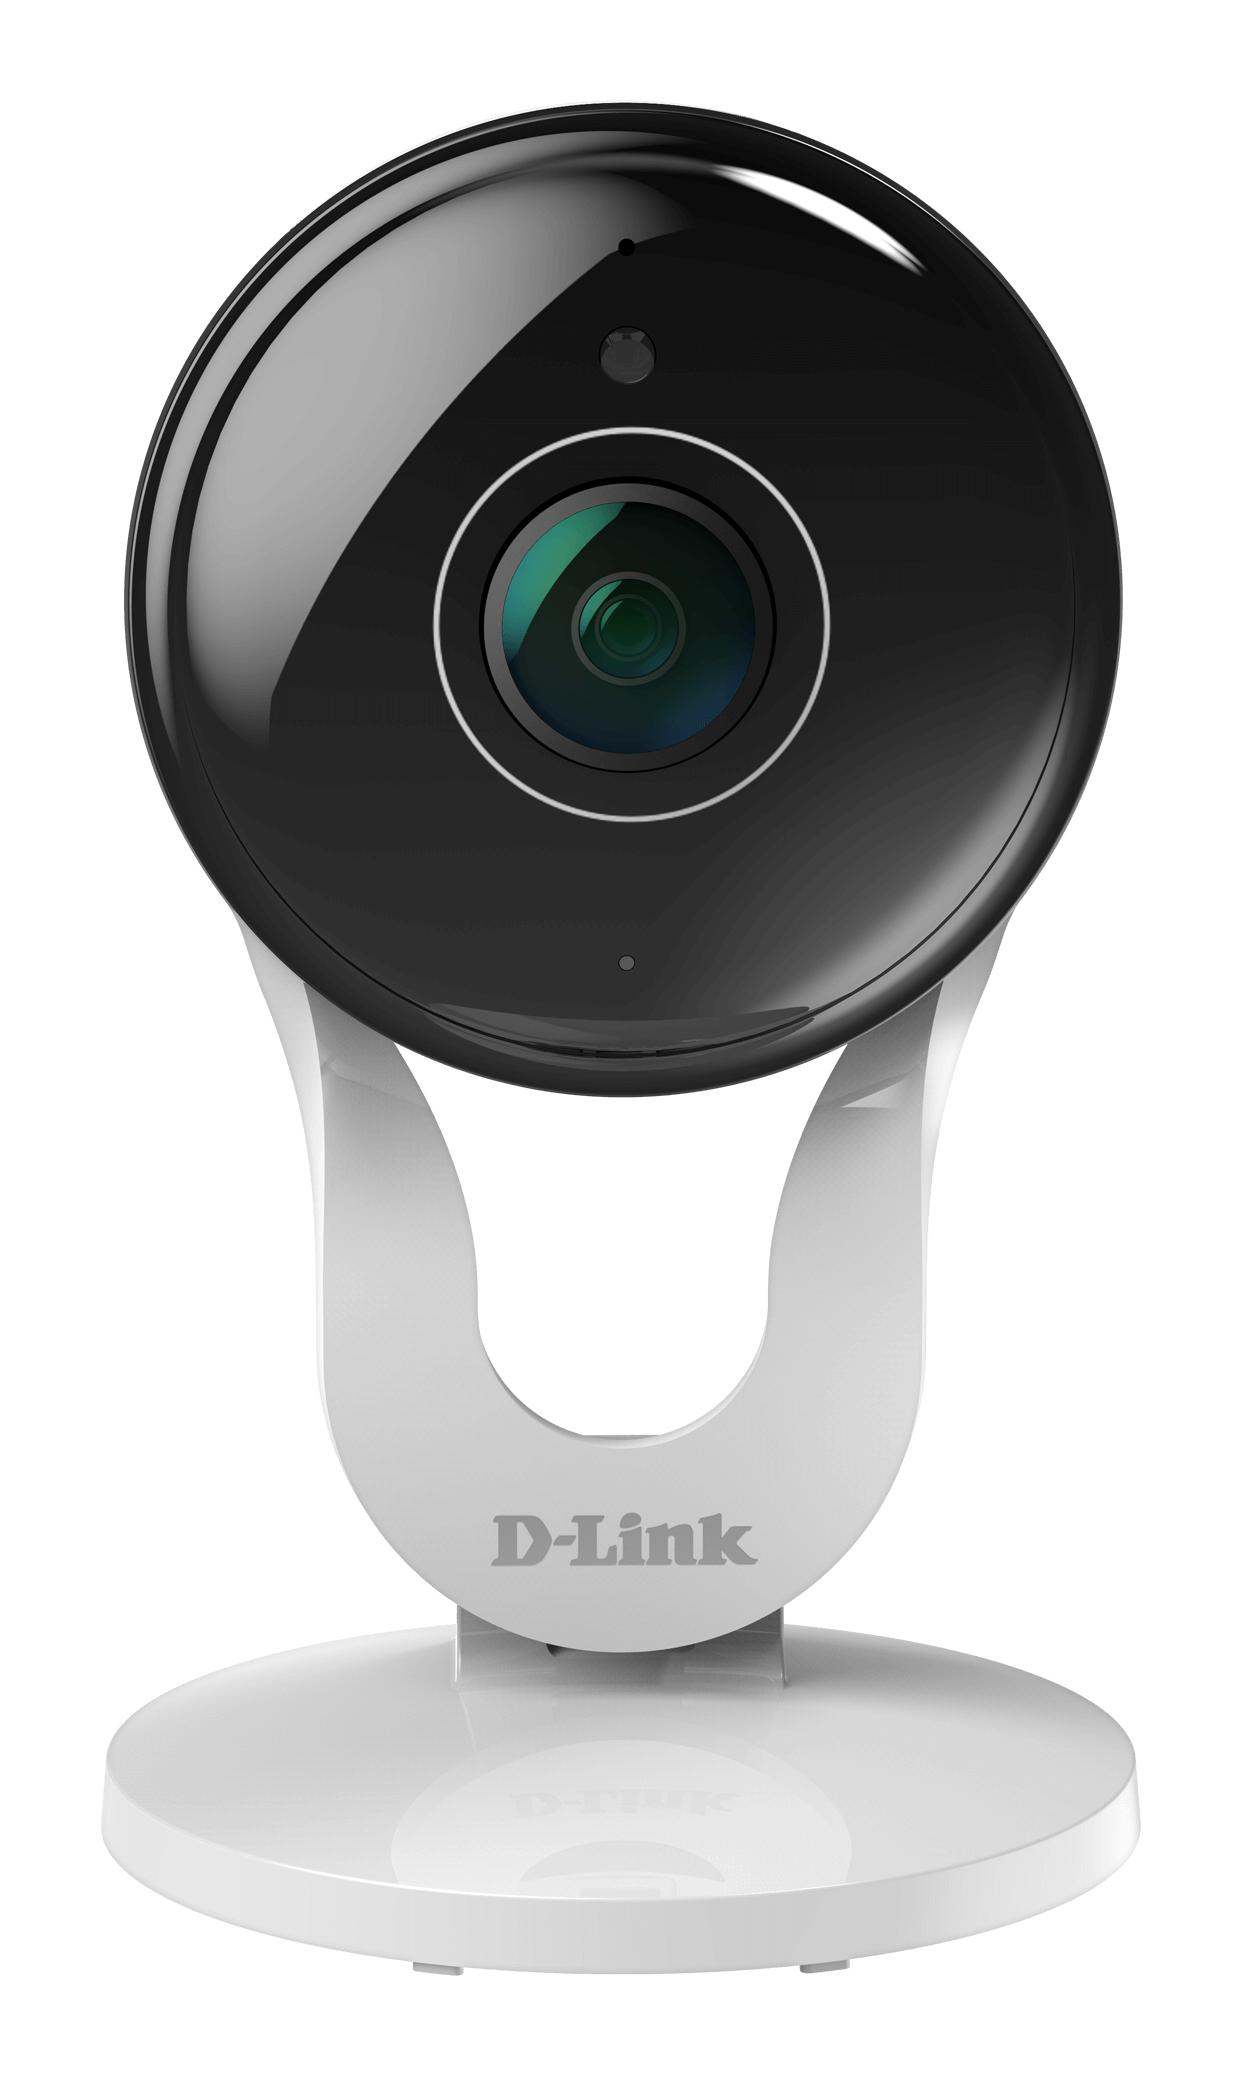 D-Link Full HD Wi-Fi Camera DCS-8300LH - IP-Sicherheitskamera - Indoor - Kabellos - CE - CE LVD - RCM - FCC Class B - ICES - Sphärisch - Tisch/Bank